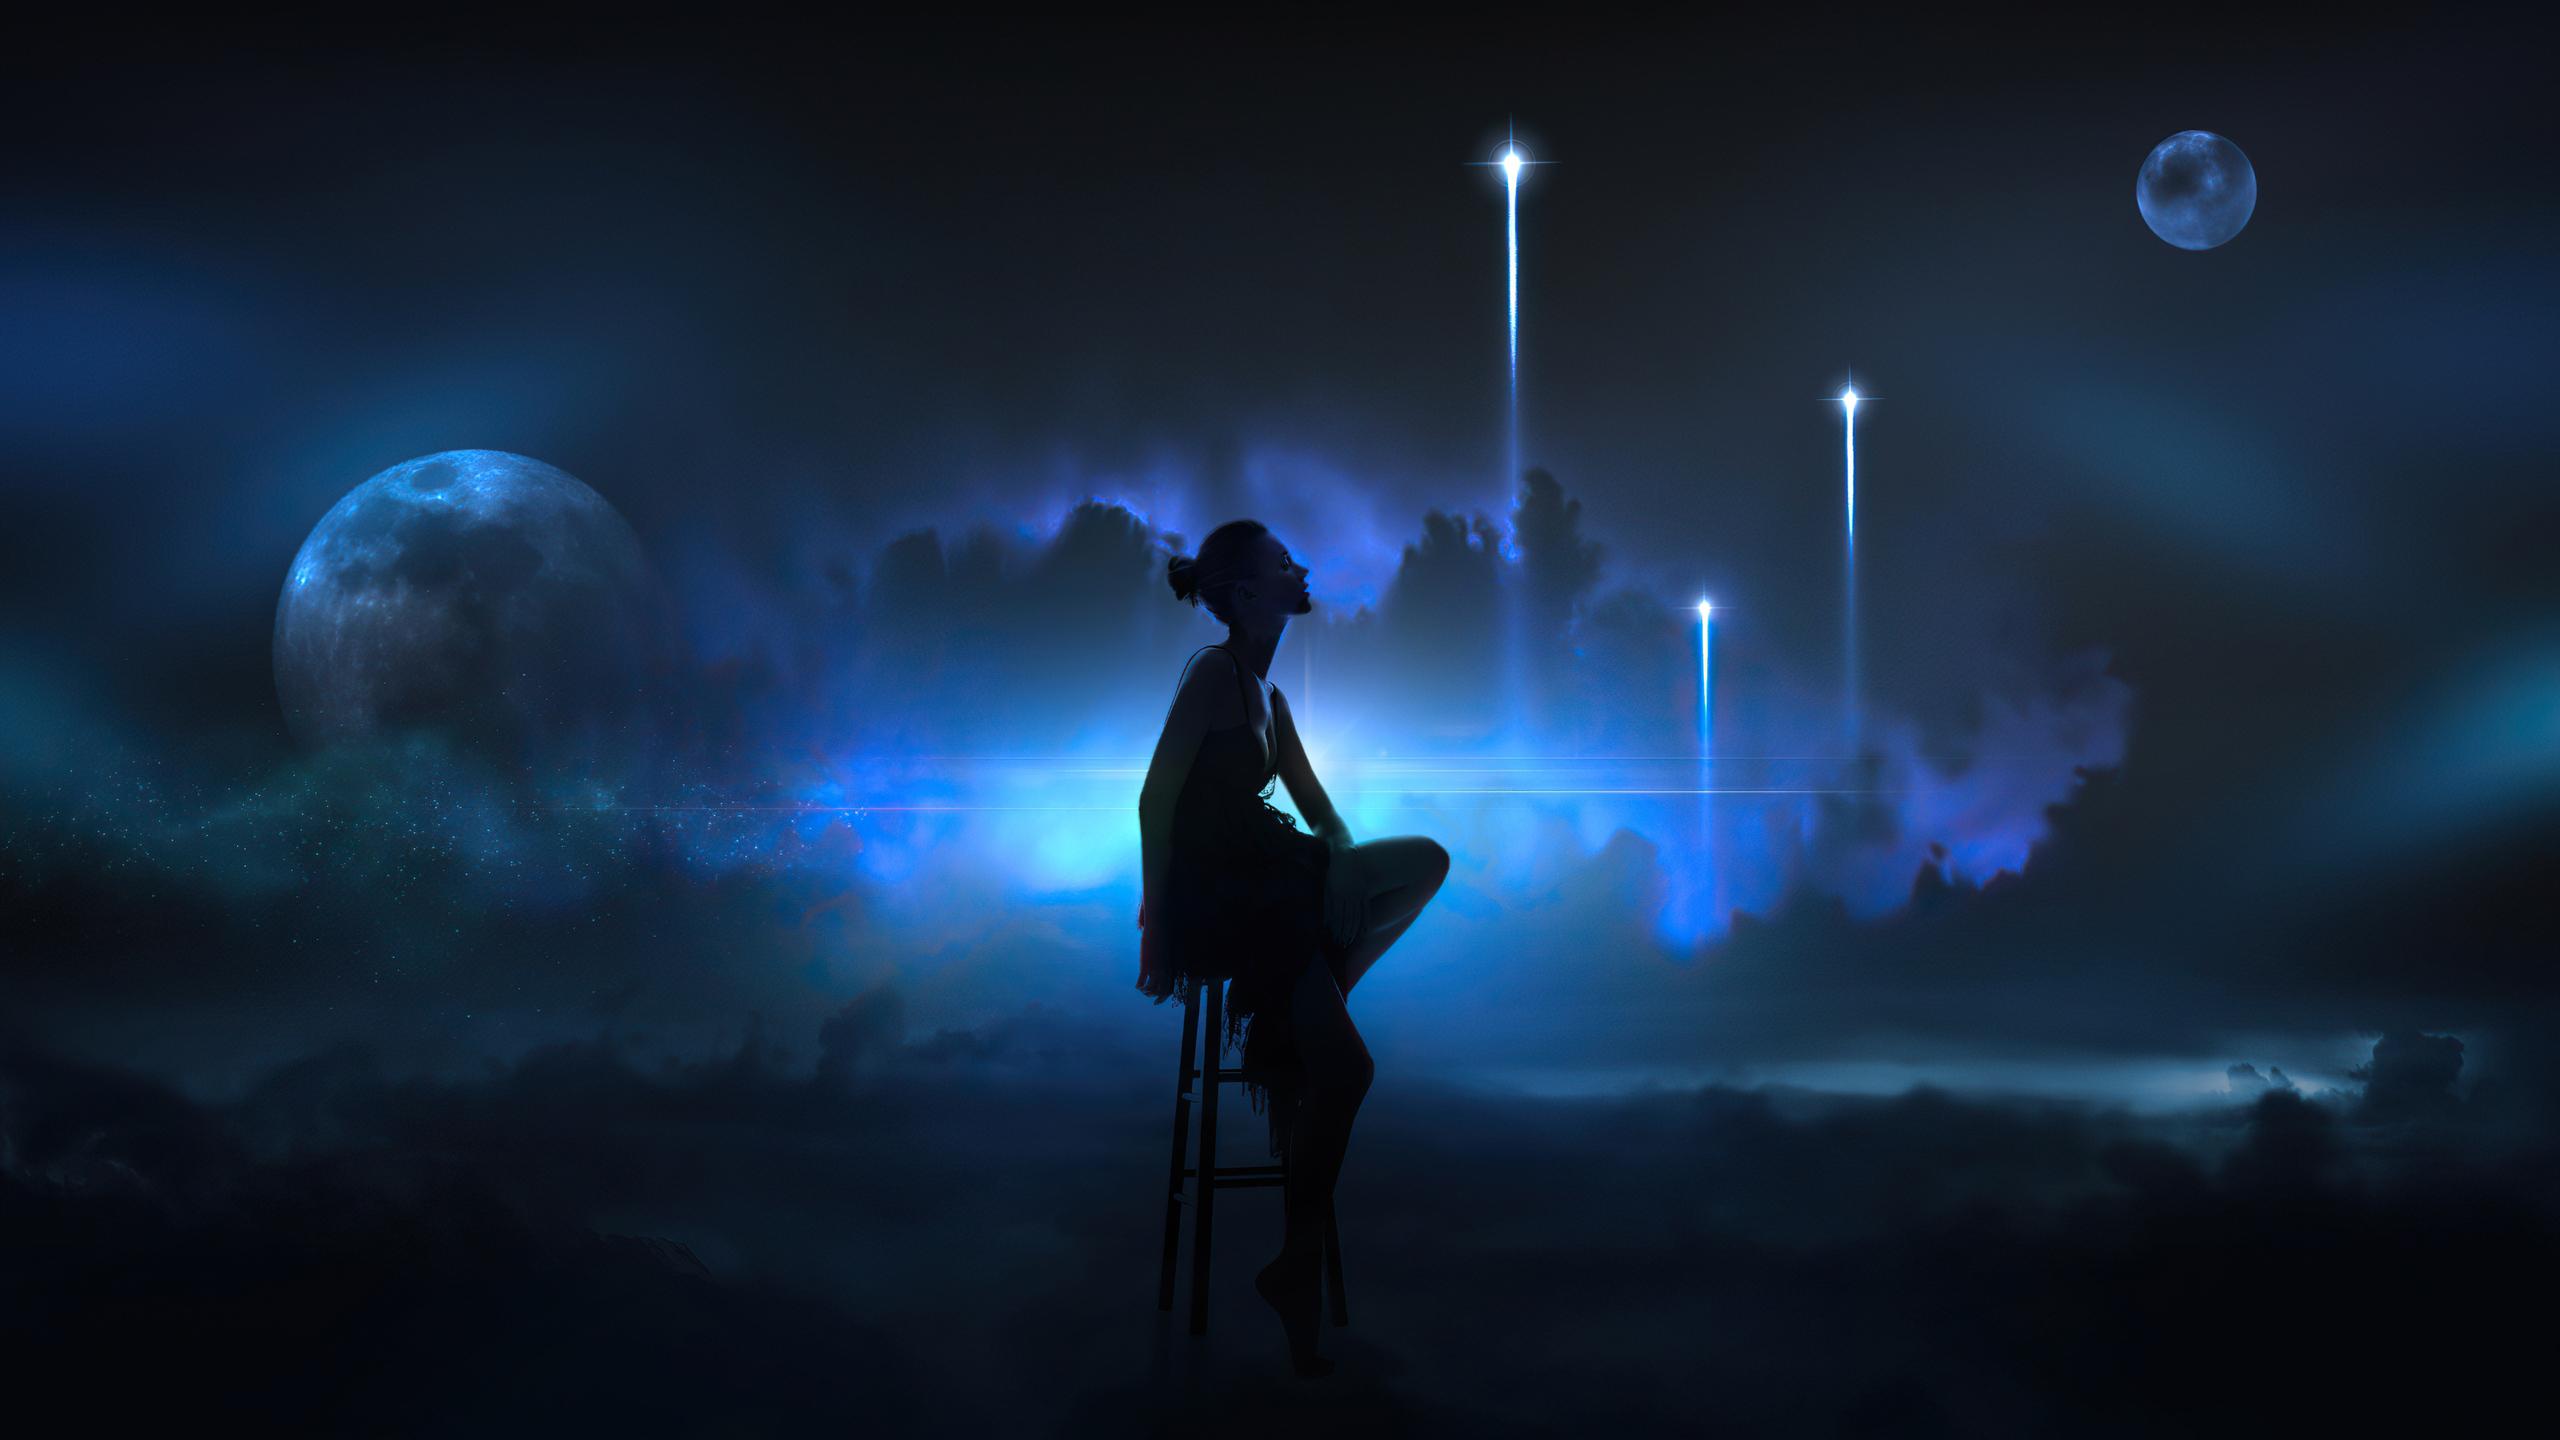 symphony-of-lights-psychedelic-trippy-woman-4k-rn.jpg